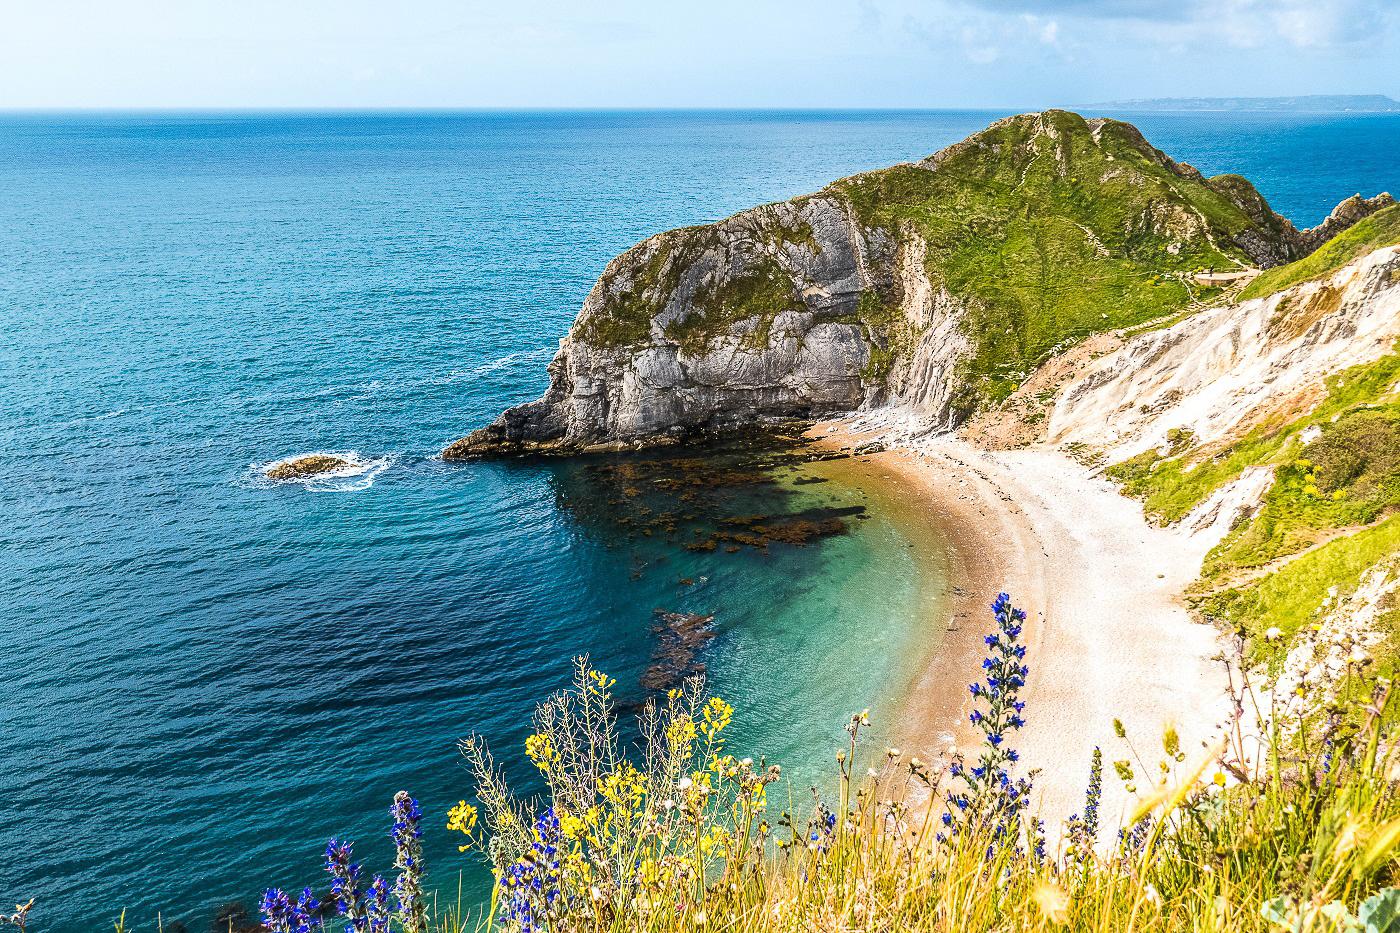 Sentier côtier du sud de l'Angleterre - On Holidays Again